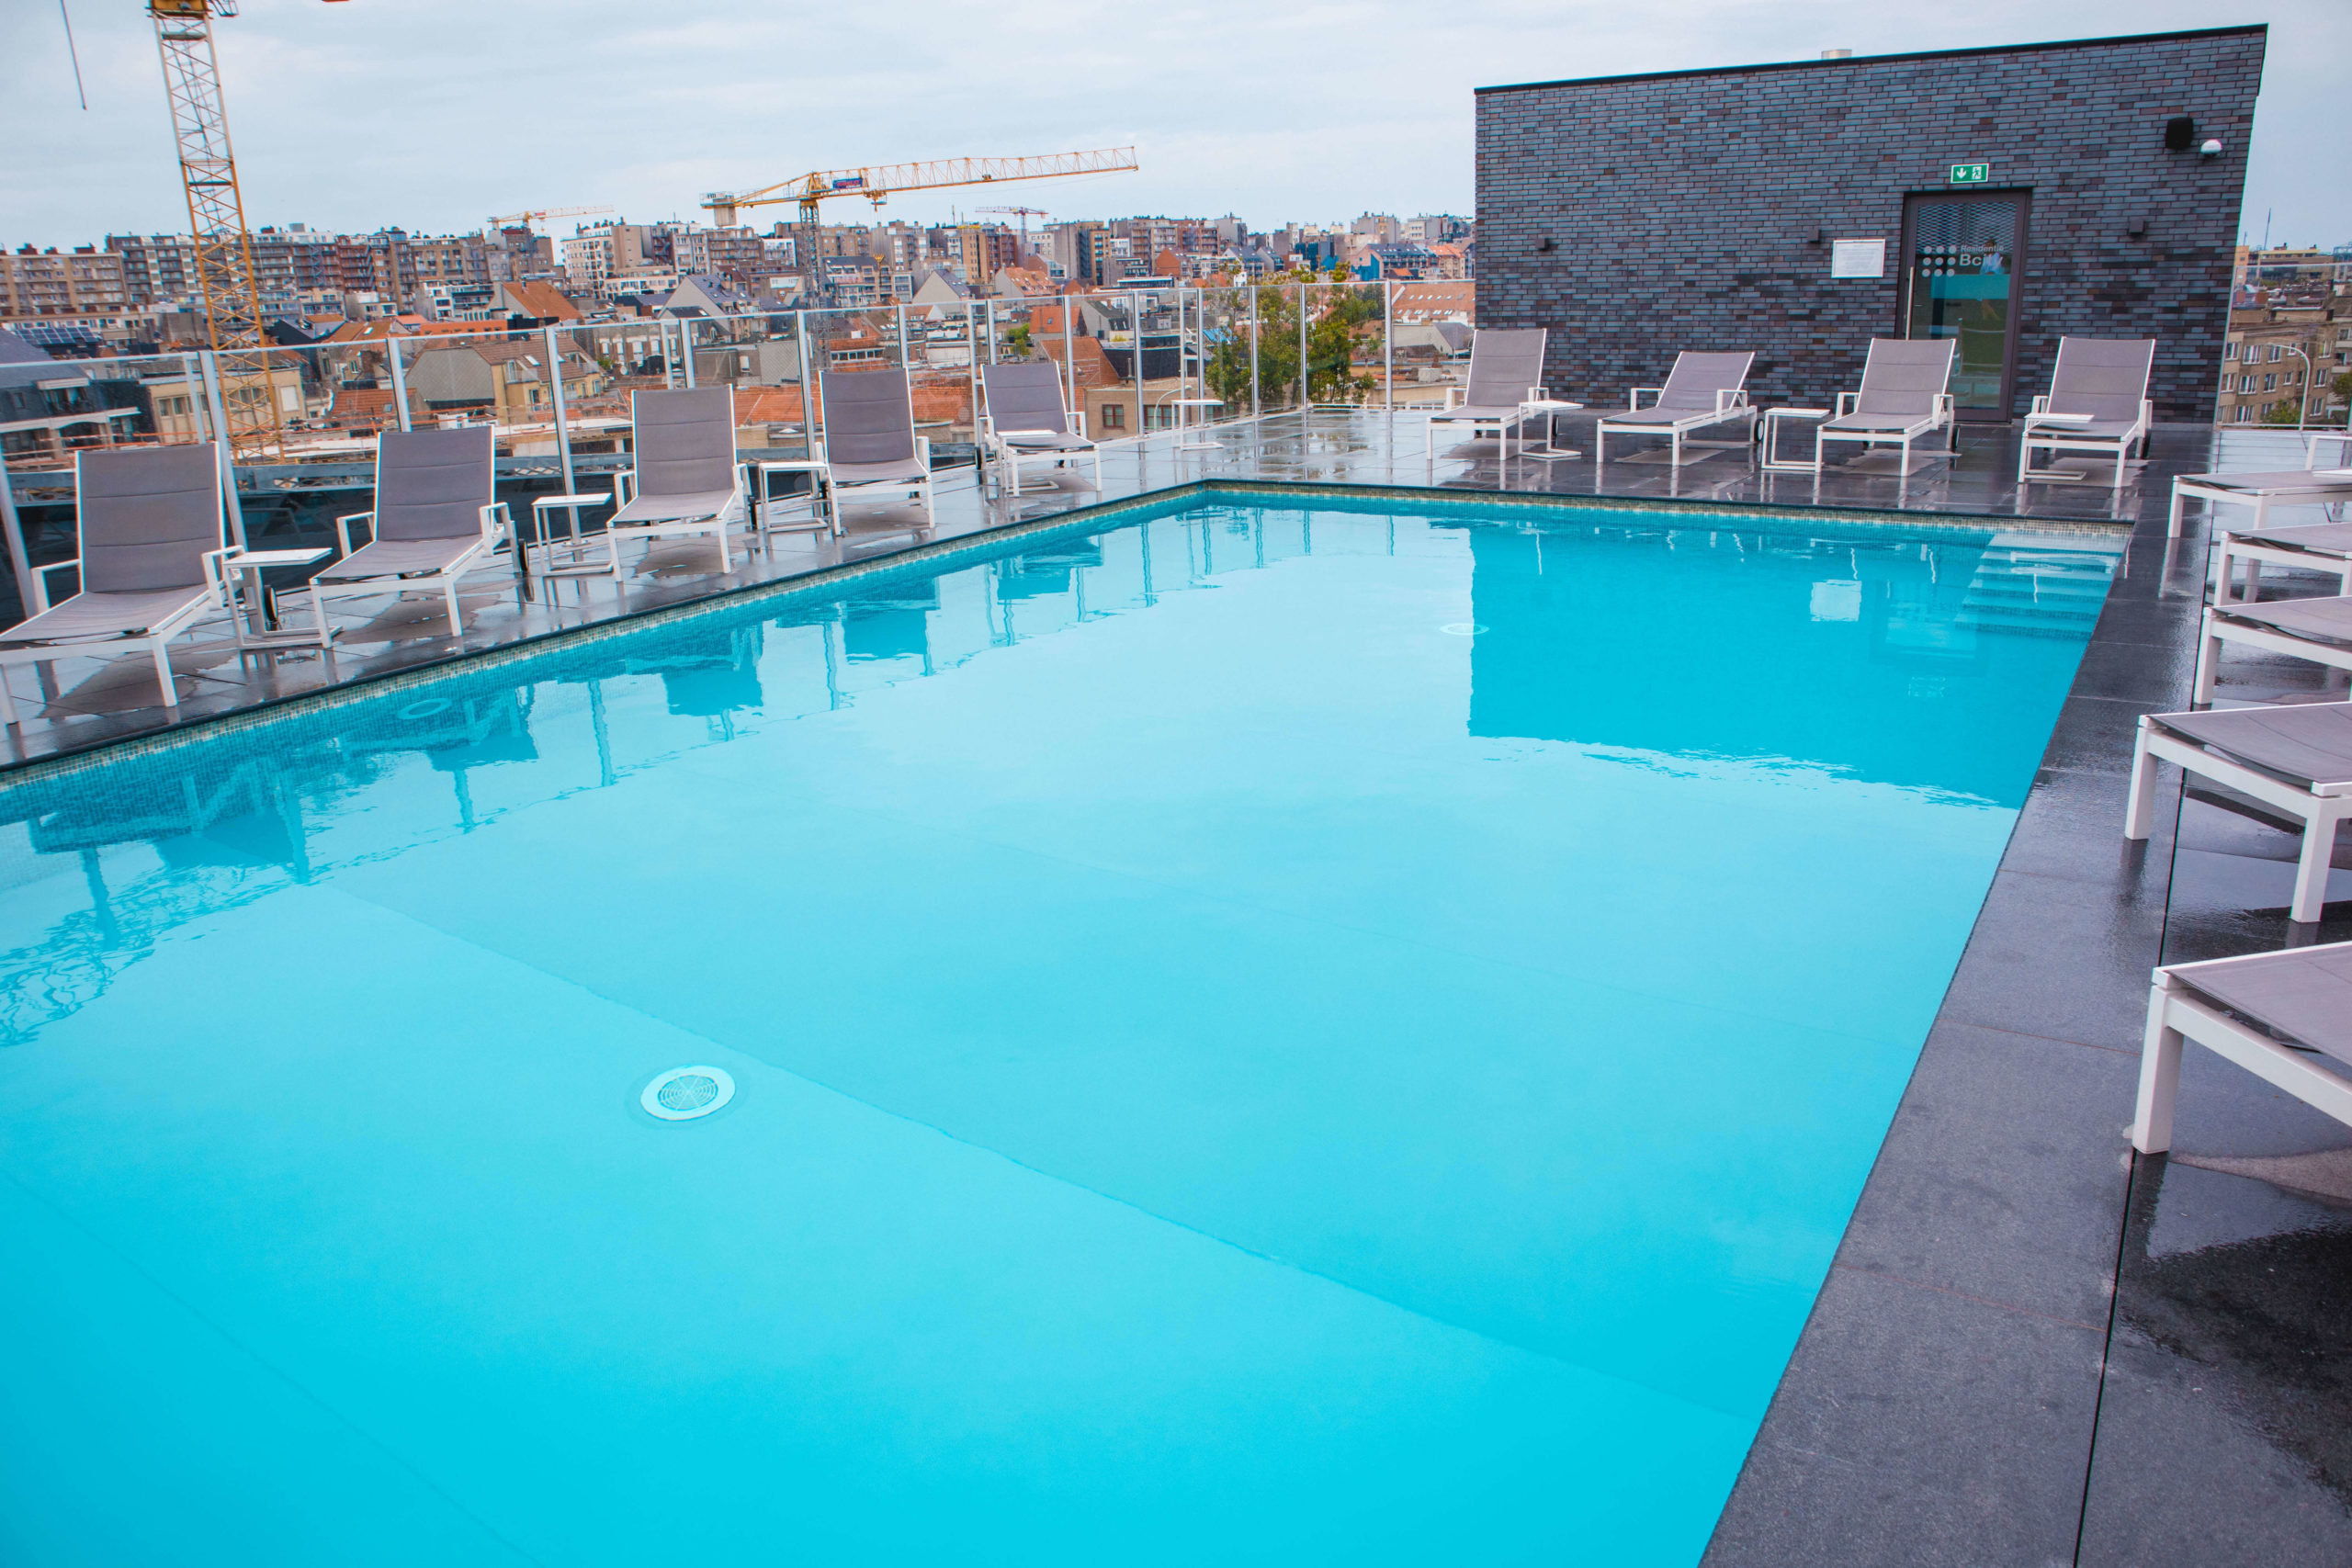 dak zwembad mercure hotel